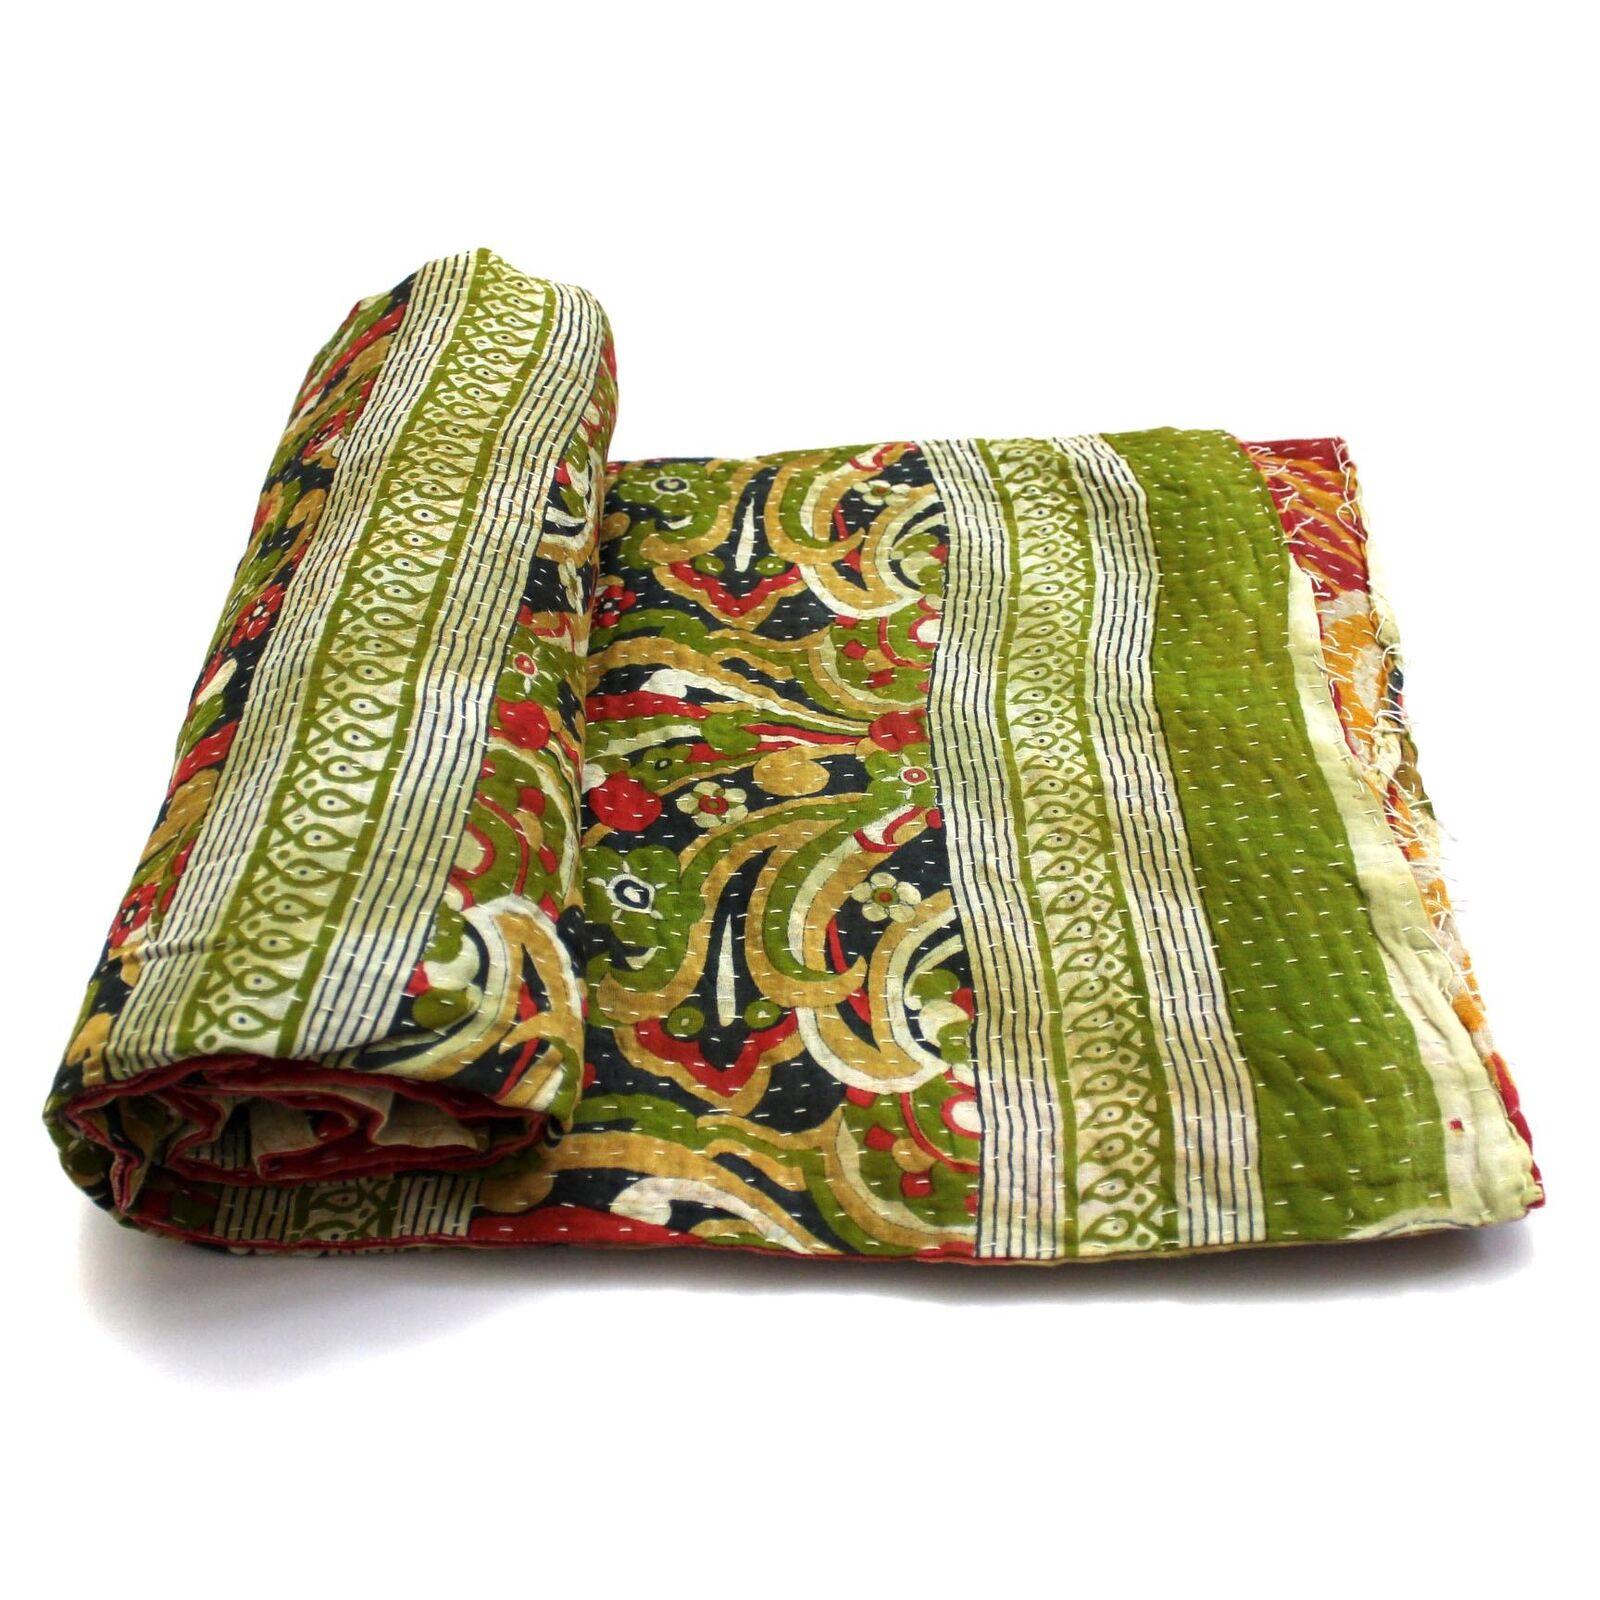 Vintage Kantha Quilt Indian Handmade Cotton Bedspread Organic Throw Bedding